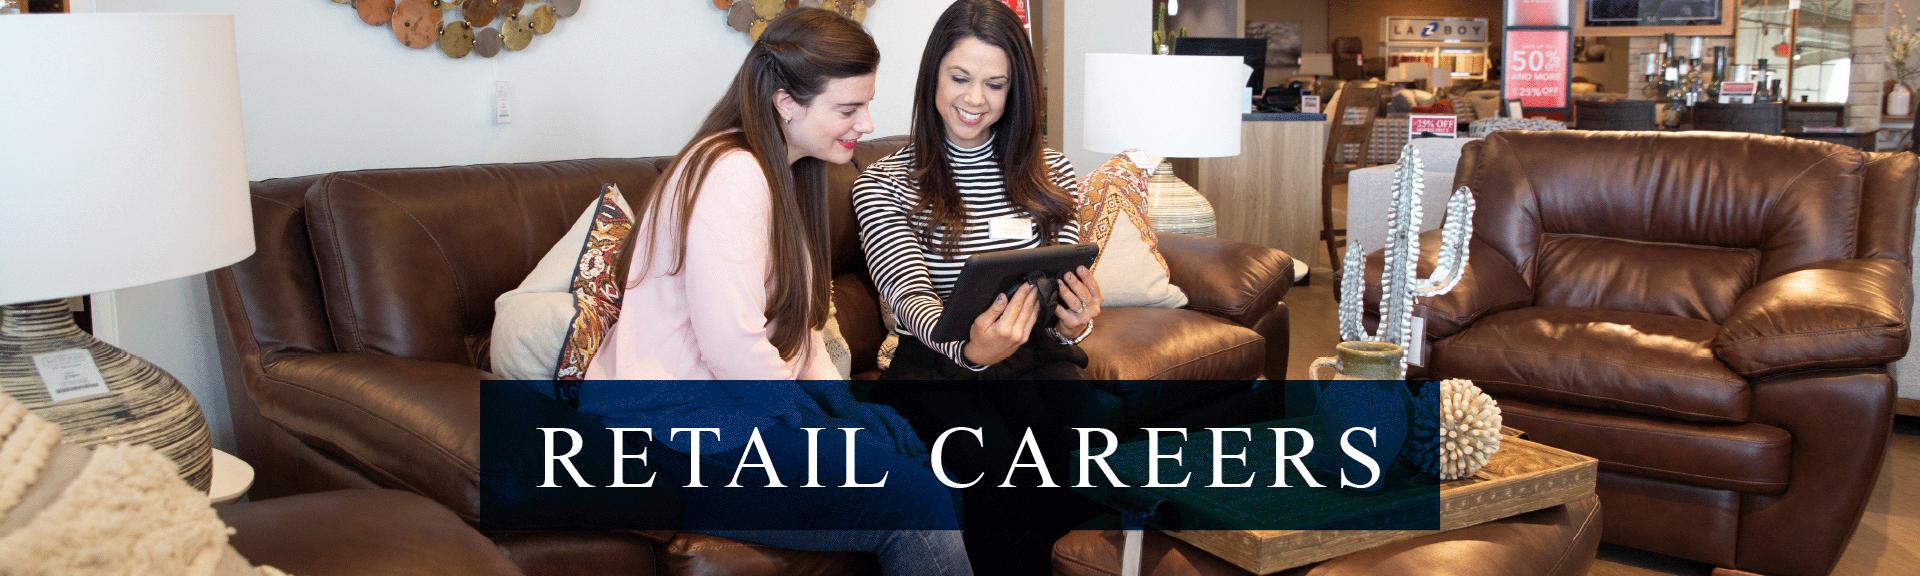 Retail Careers Desktop